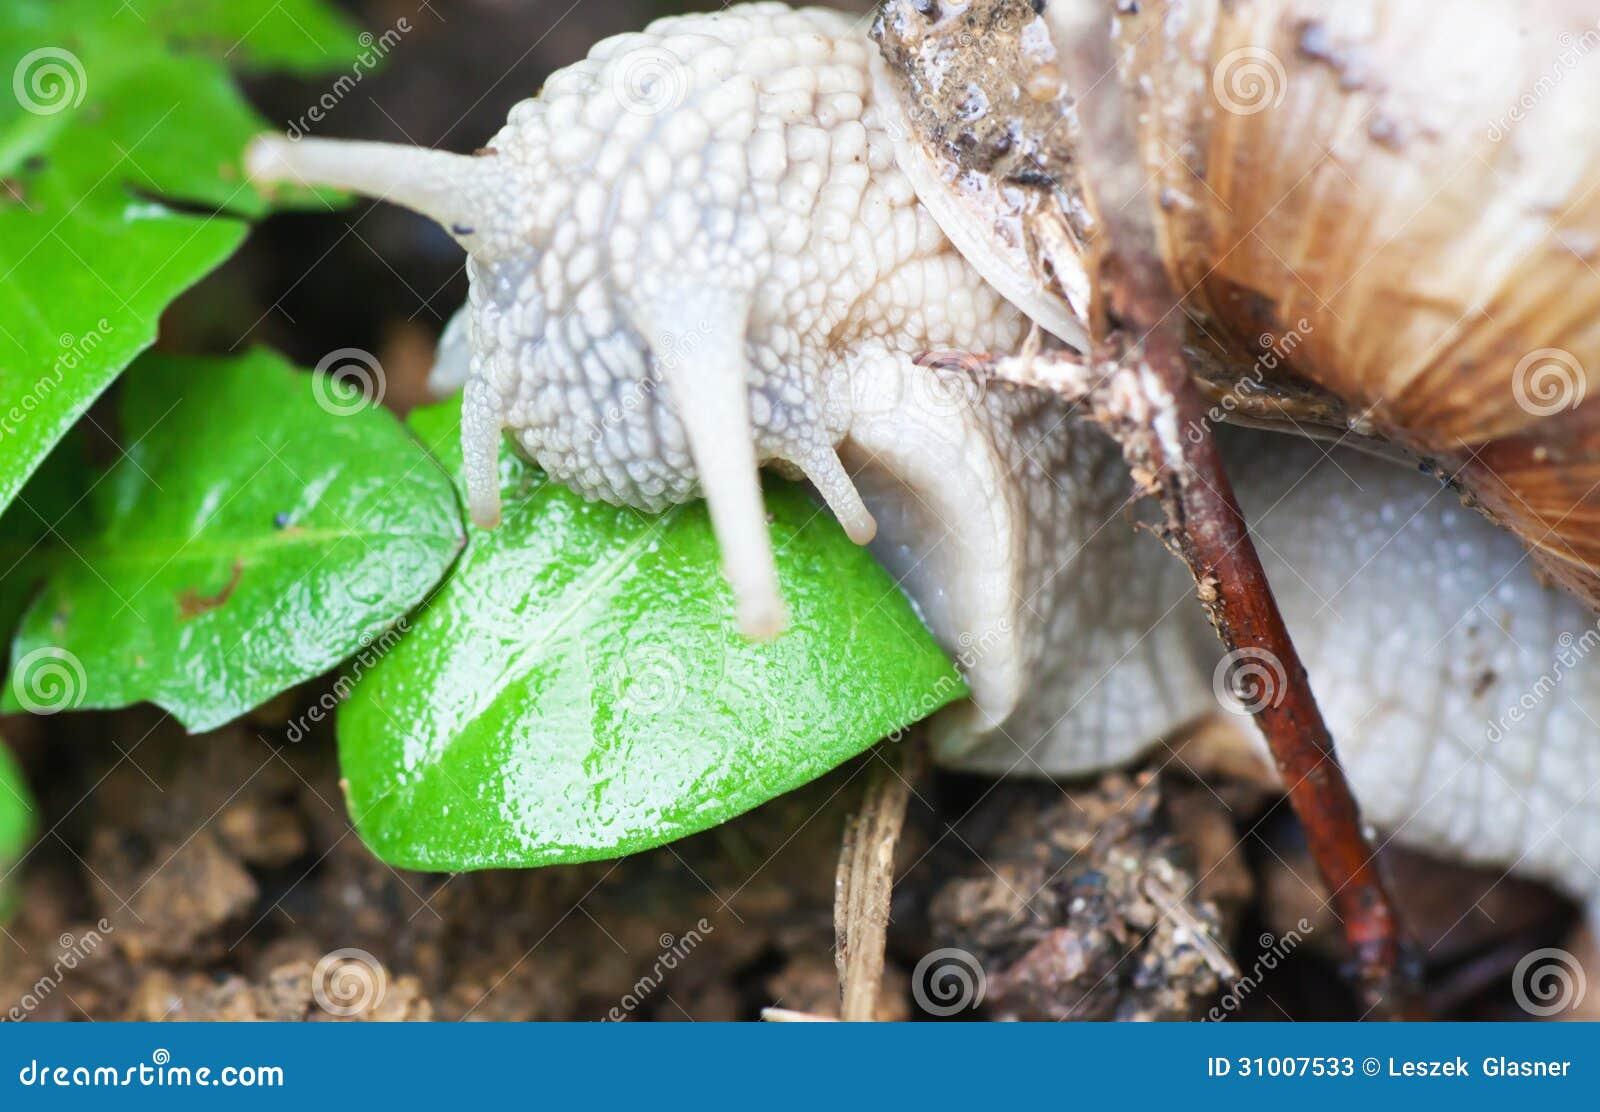 le macro escargot romain mange la feuille photos stock image 31007533. Black Bedroom Furniture Sets. Home Design Ideas